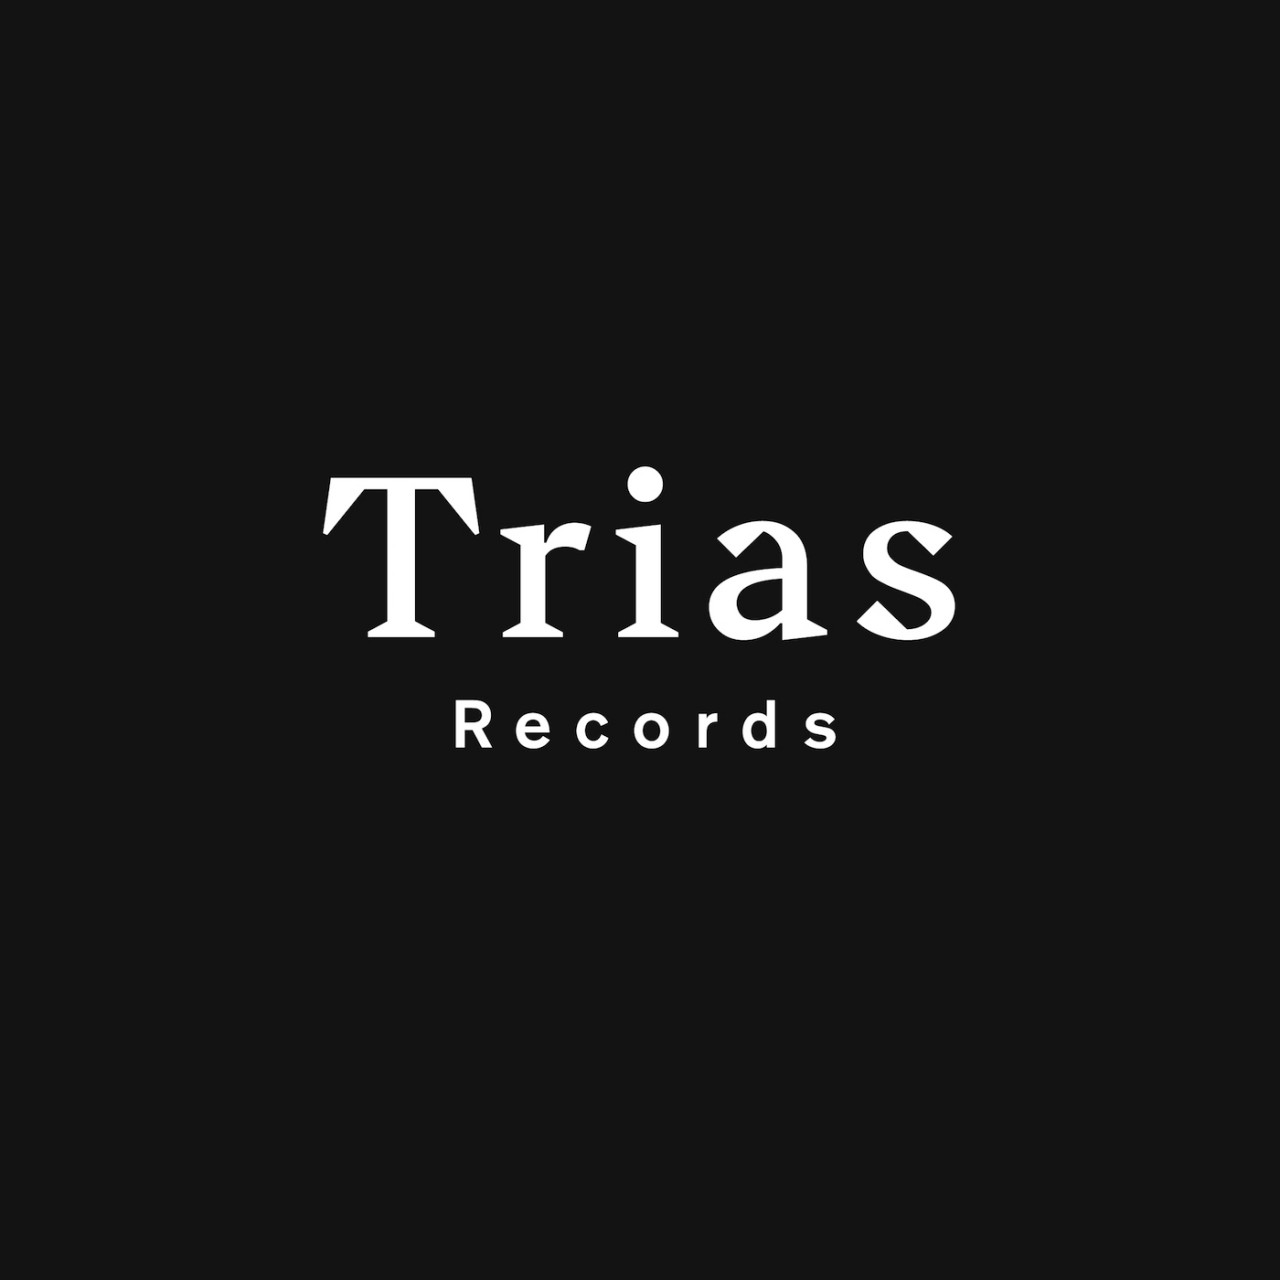 Trias Records Contact